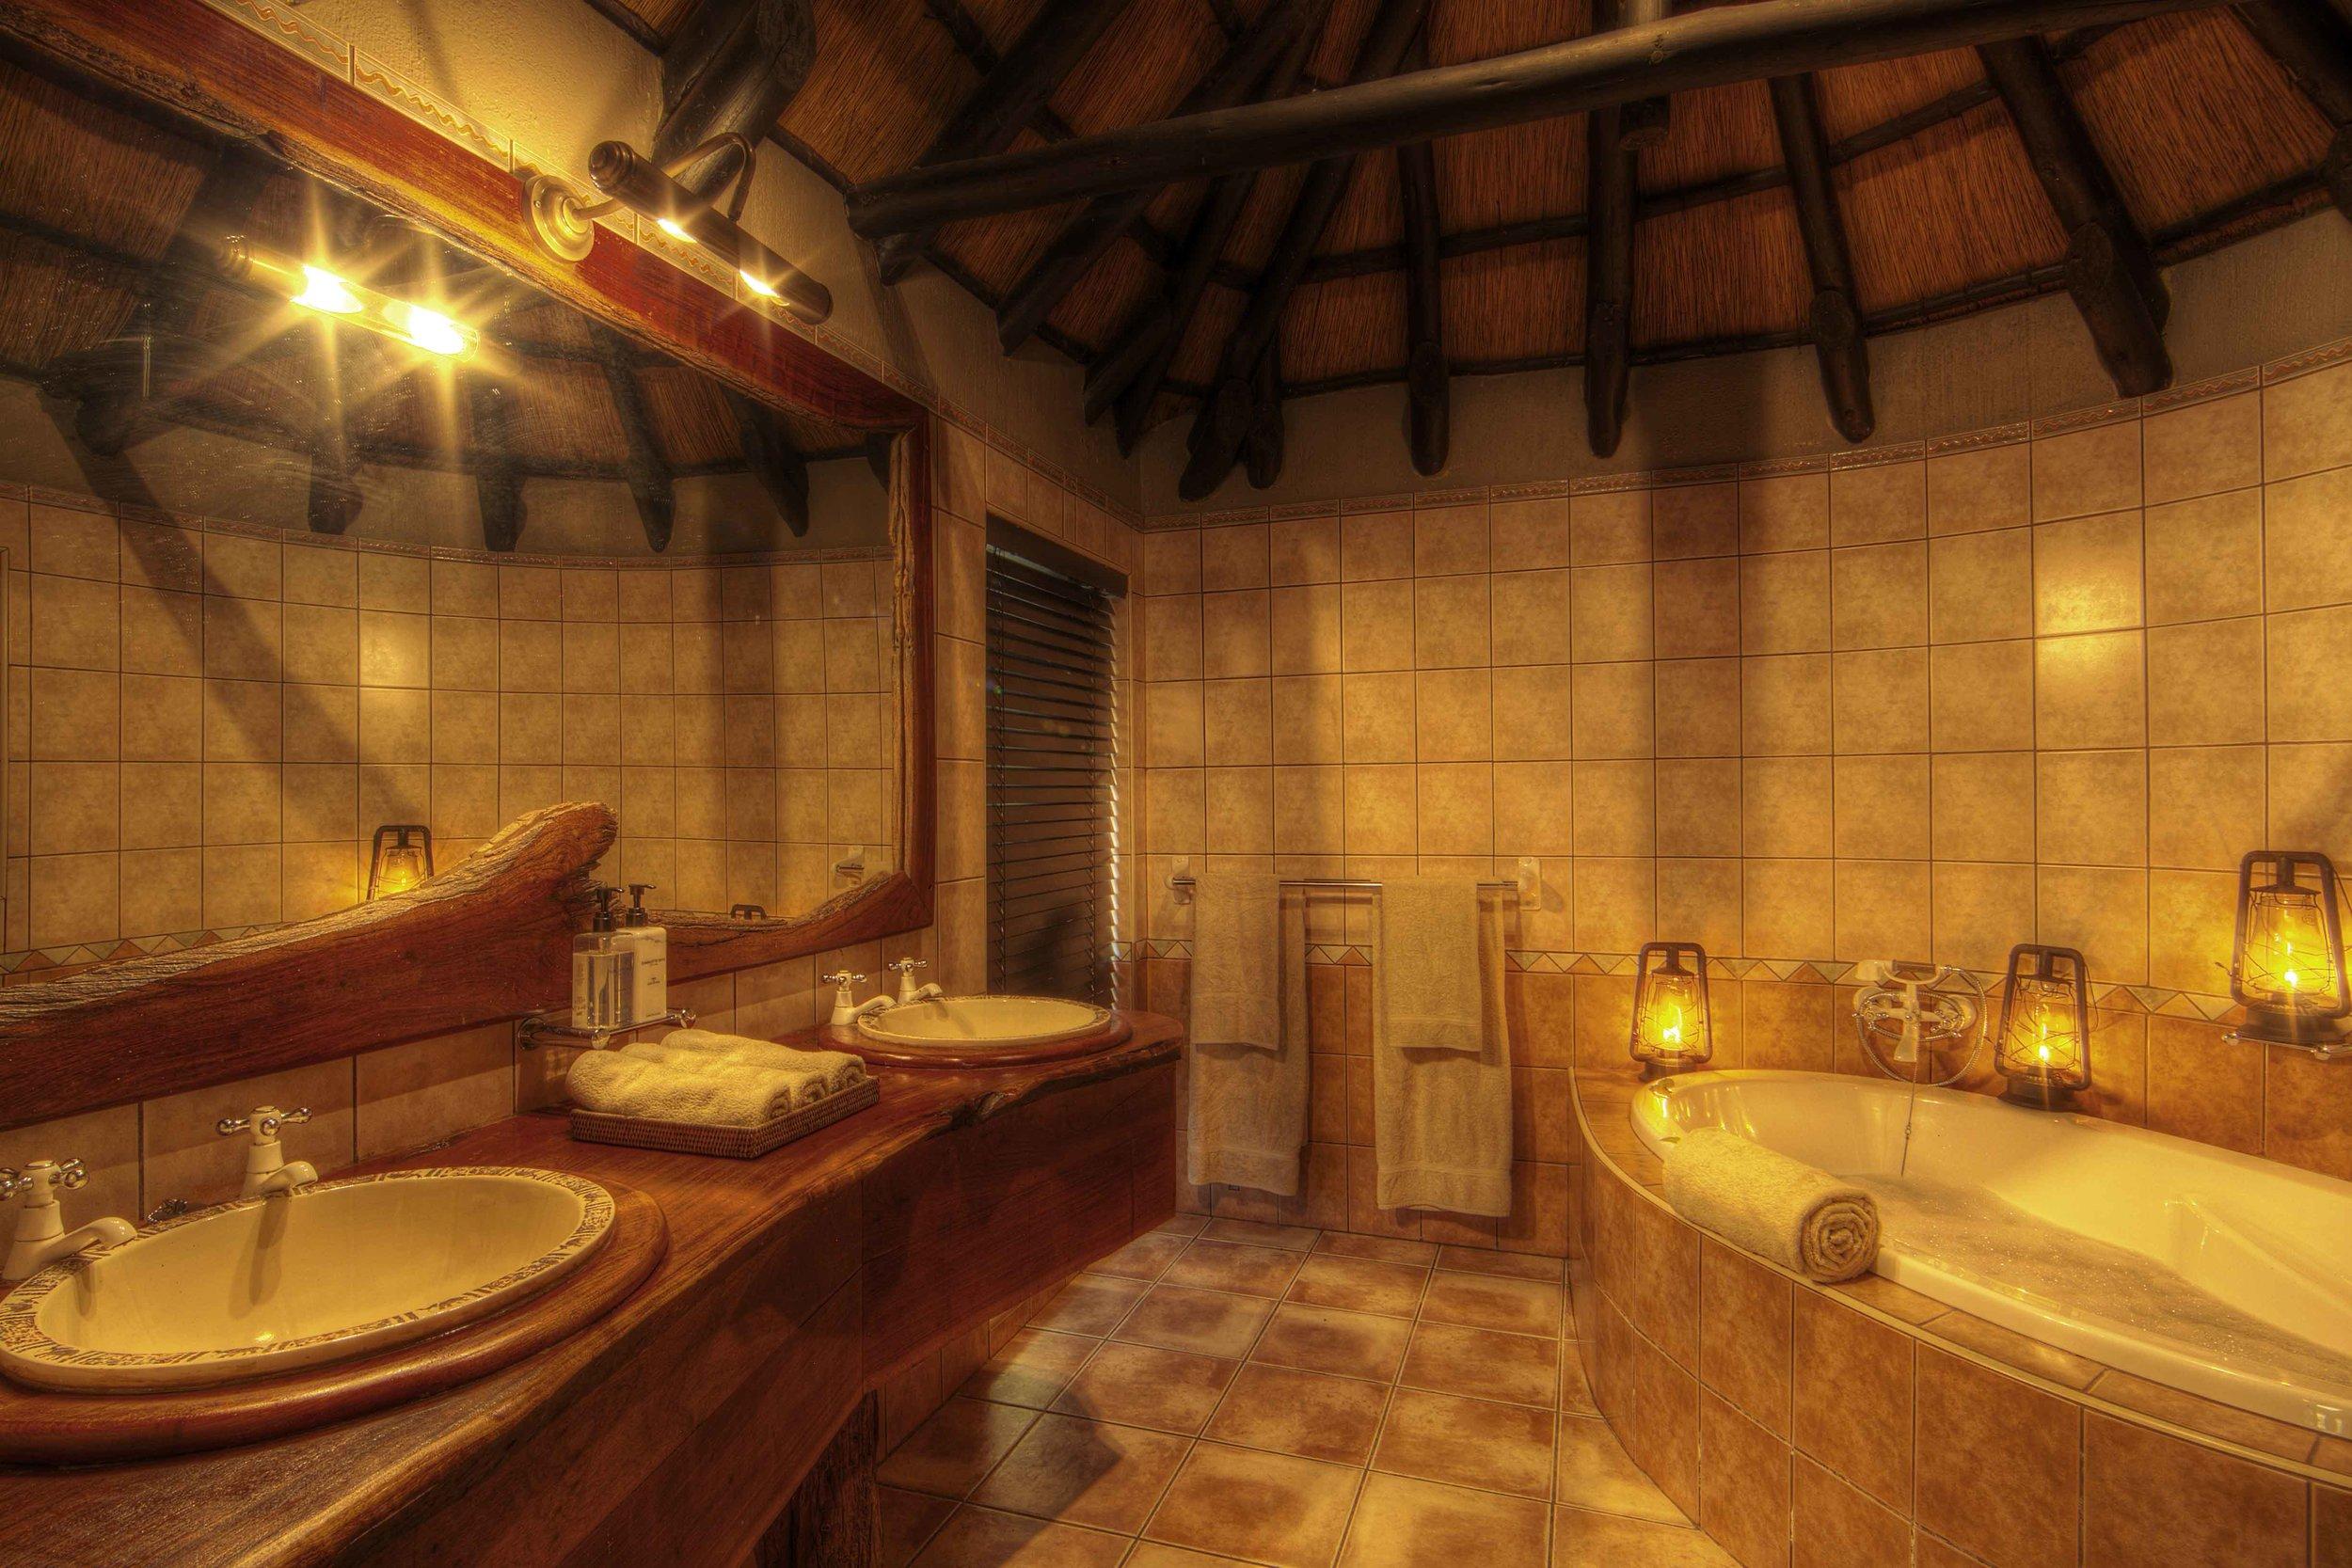 BathRoom_Sava_99351.jpg